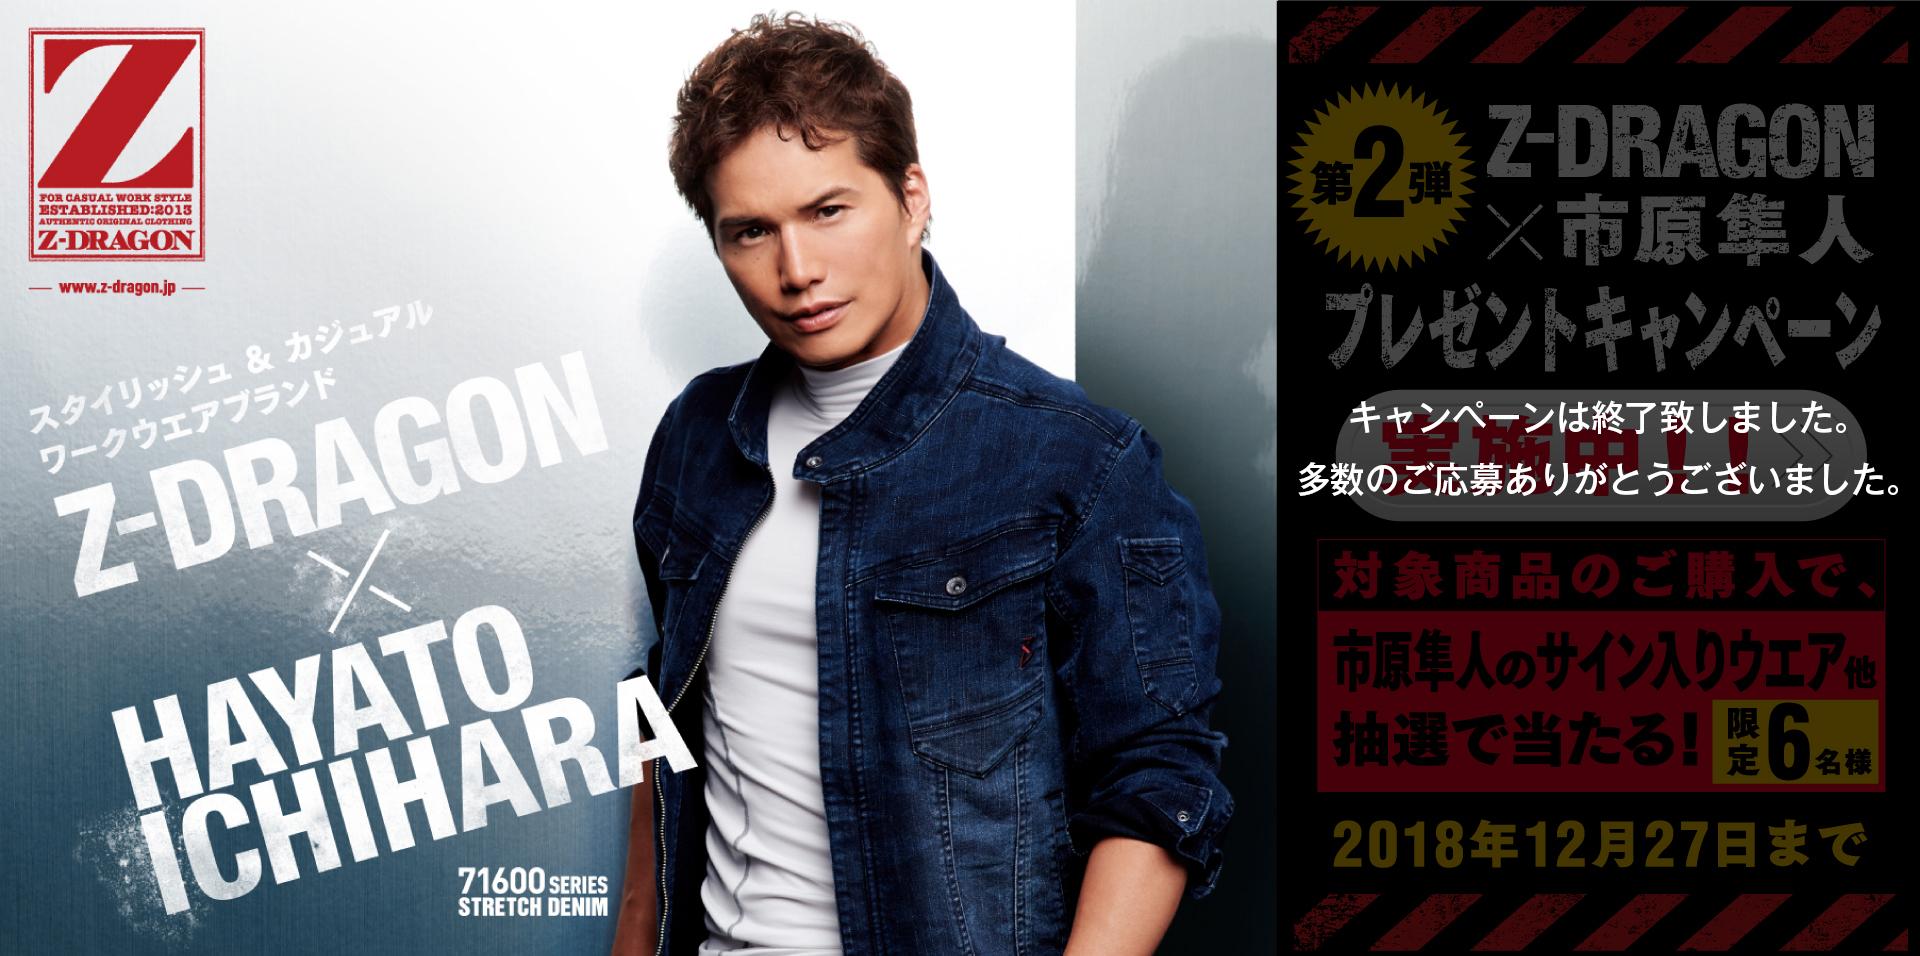 Z-DRAGON×市原隼人ダブルチャンスプレゼントキャンペーン第2弾!